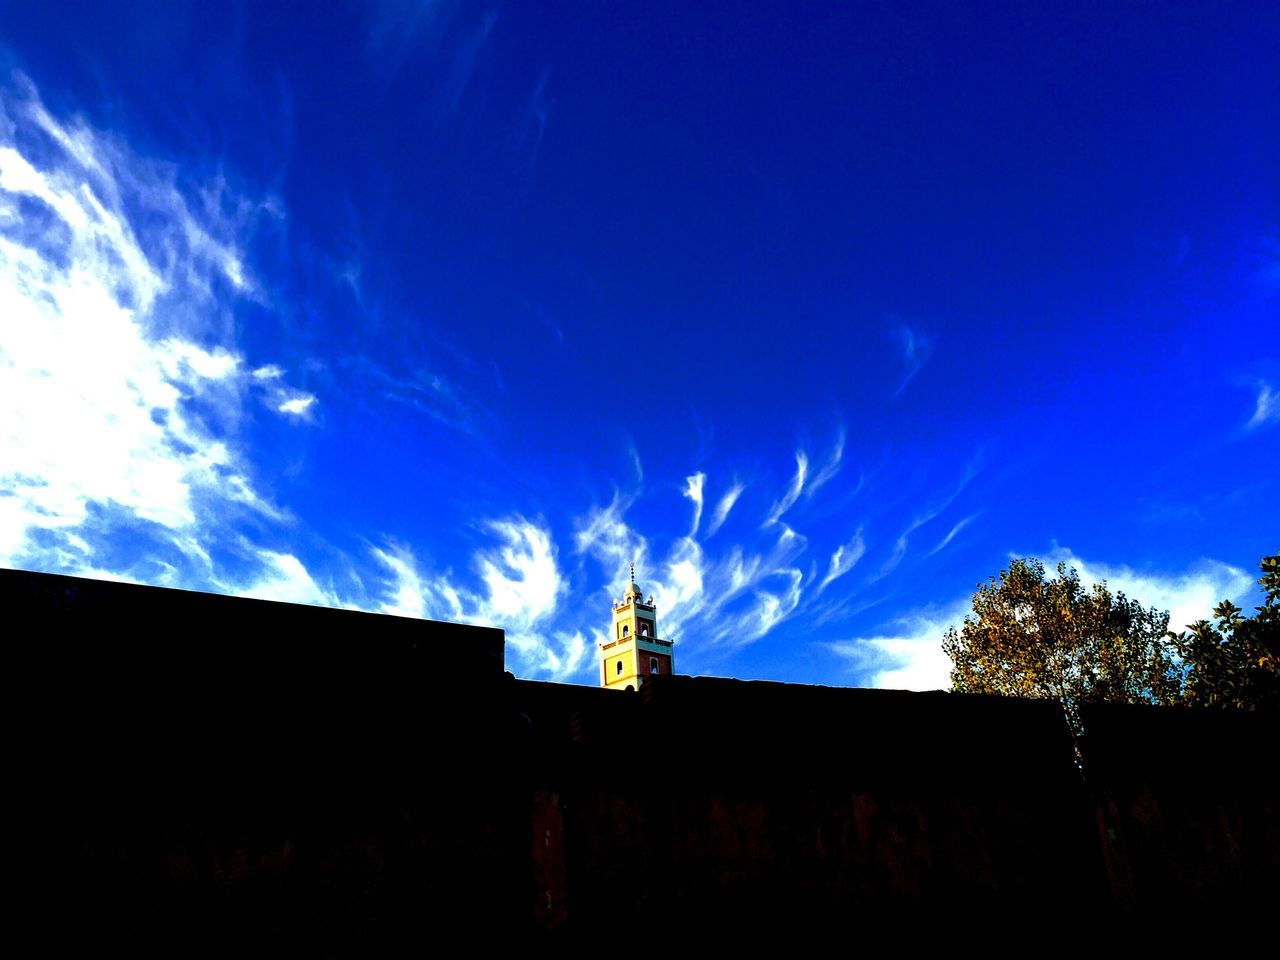 Islam Islamic Architecture Masjed  Sky Clouds And Sky Annaba Algeria الجزائر Niceday The City Light